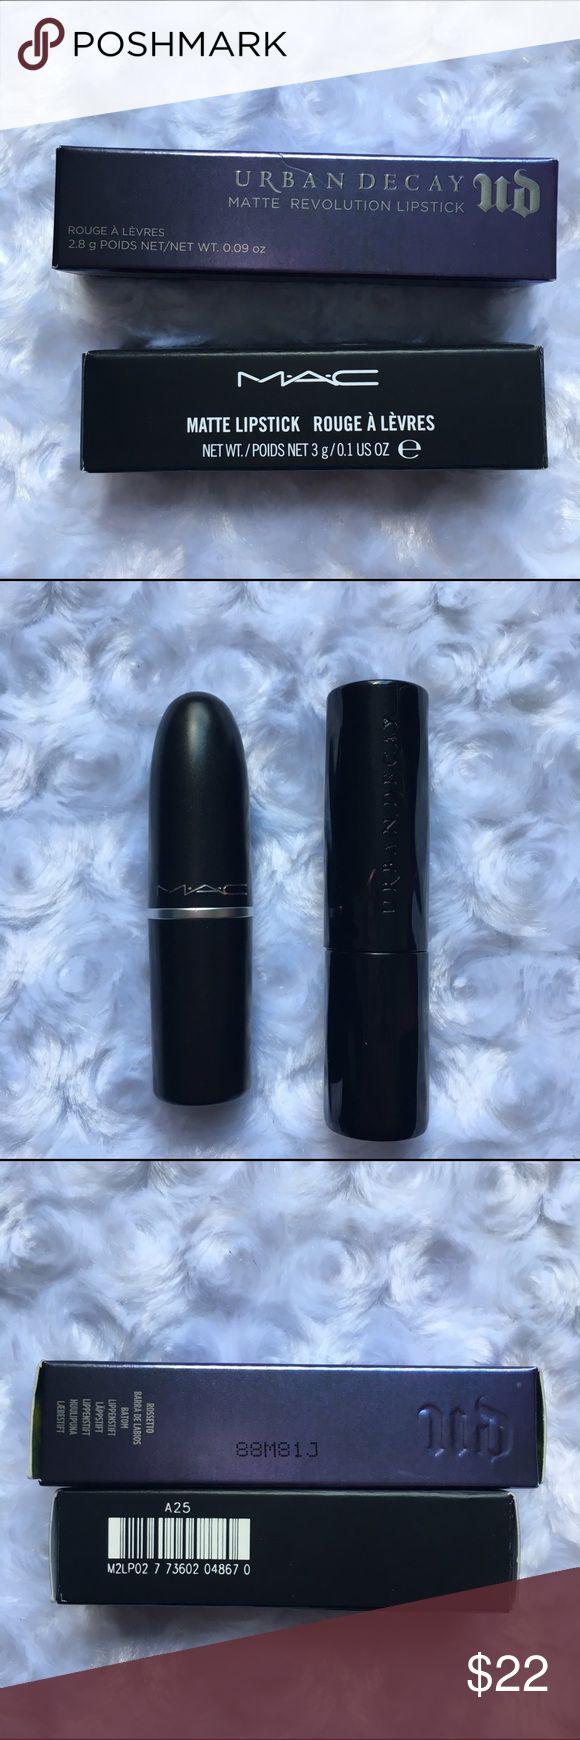 MAC Diva and UD Bad Blood lipstick Authentic Brand new in box MAC diva lipstick and Urban Decay Matte revolution lipstick in bad blood. MAC Cosmetics Makeup Lipstick